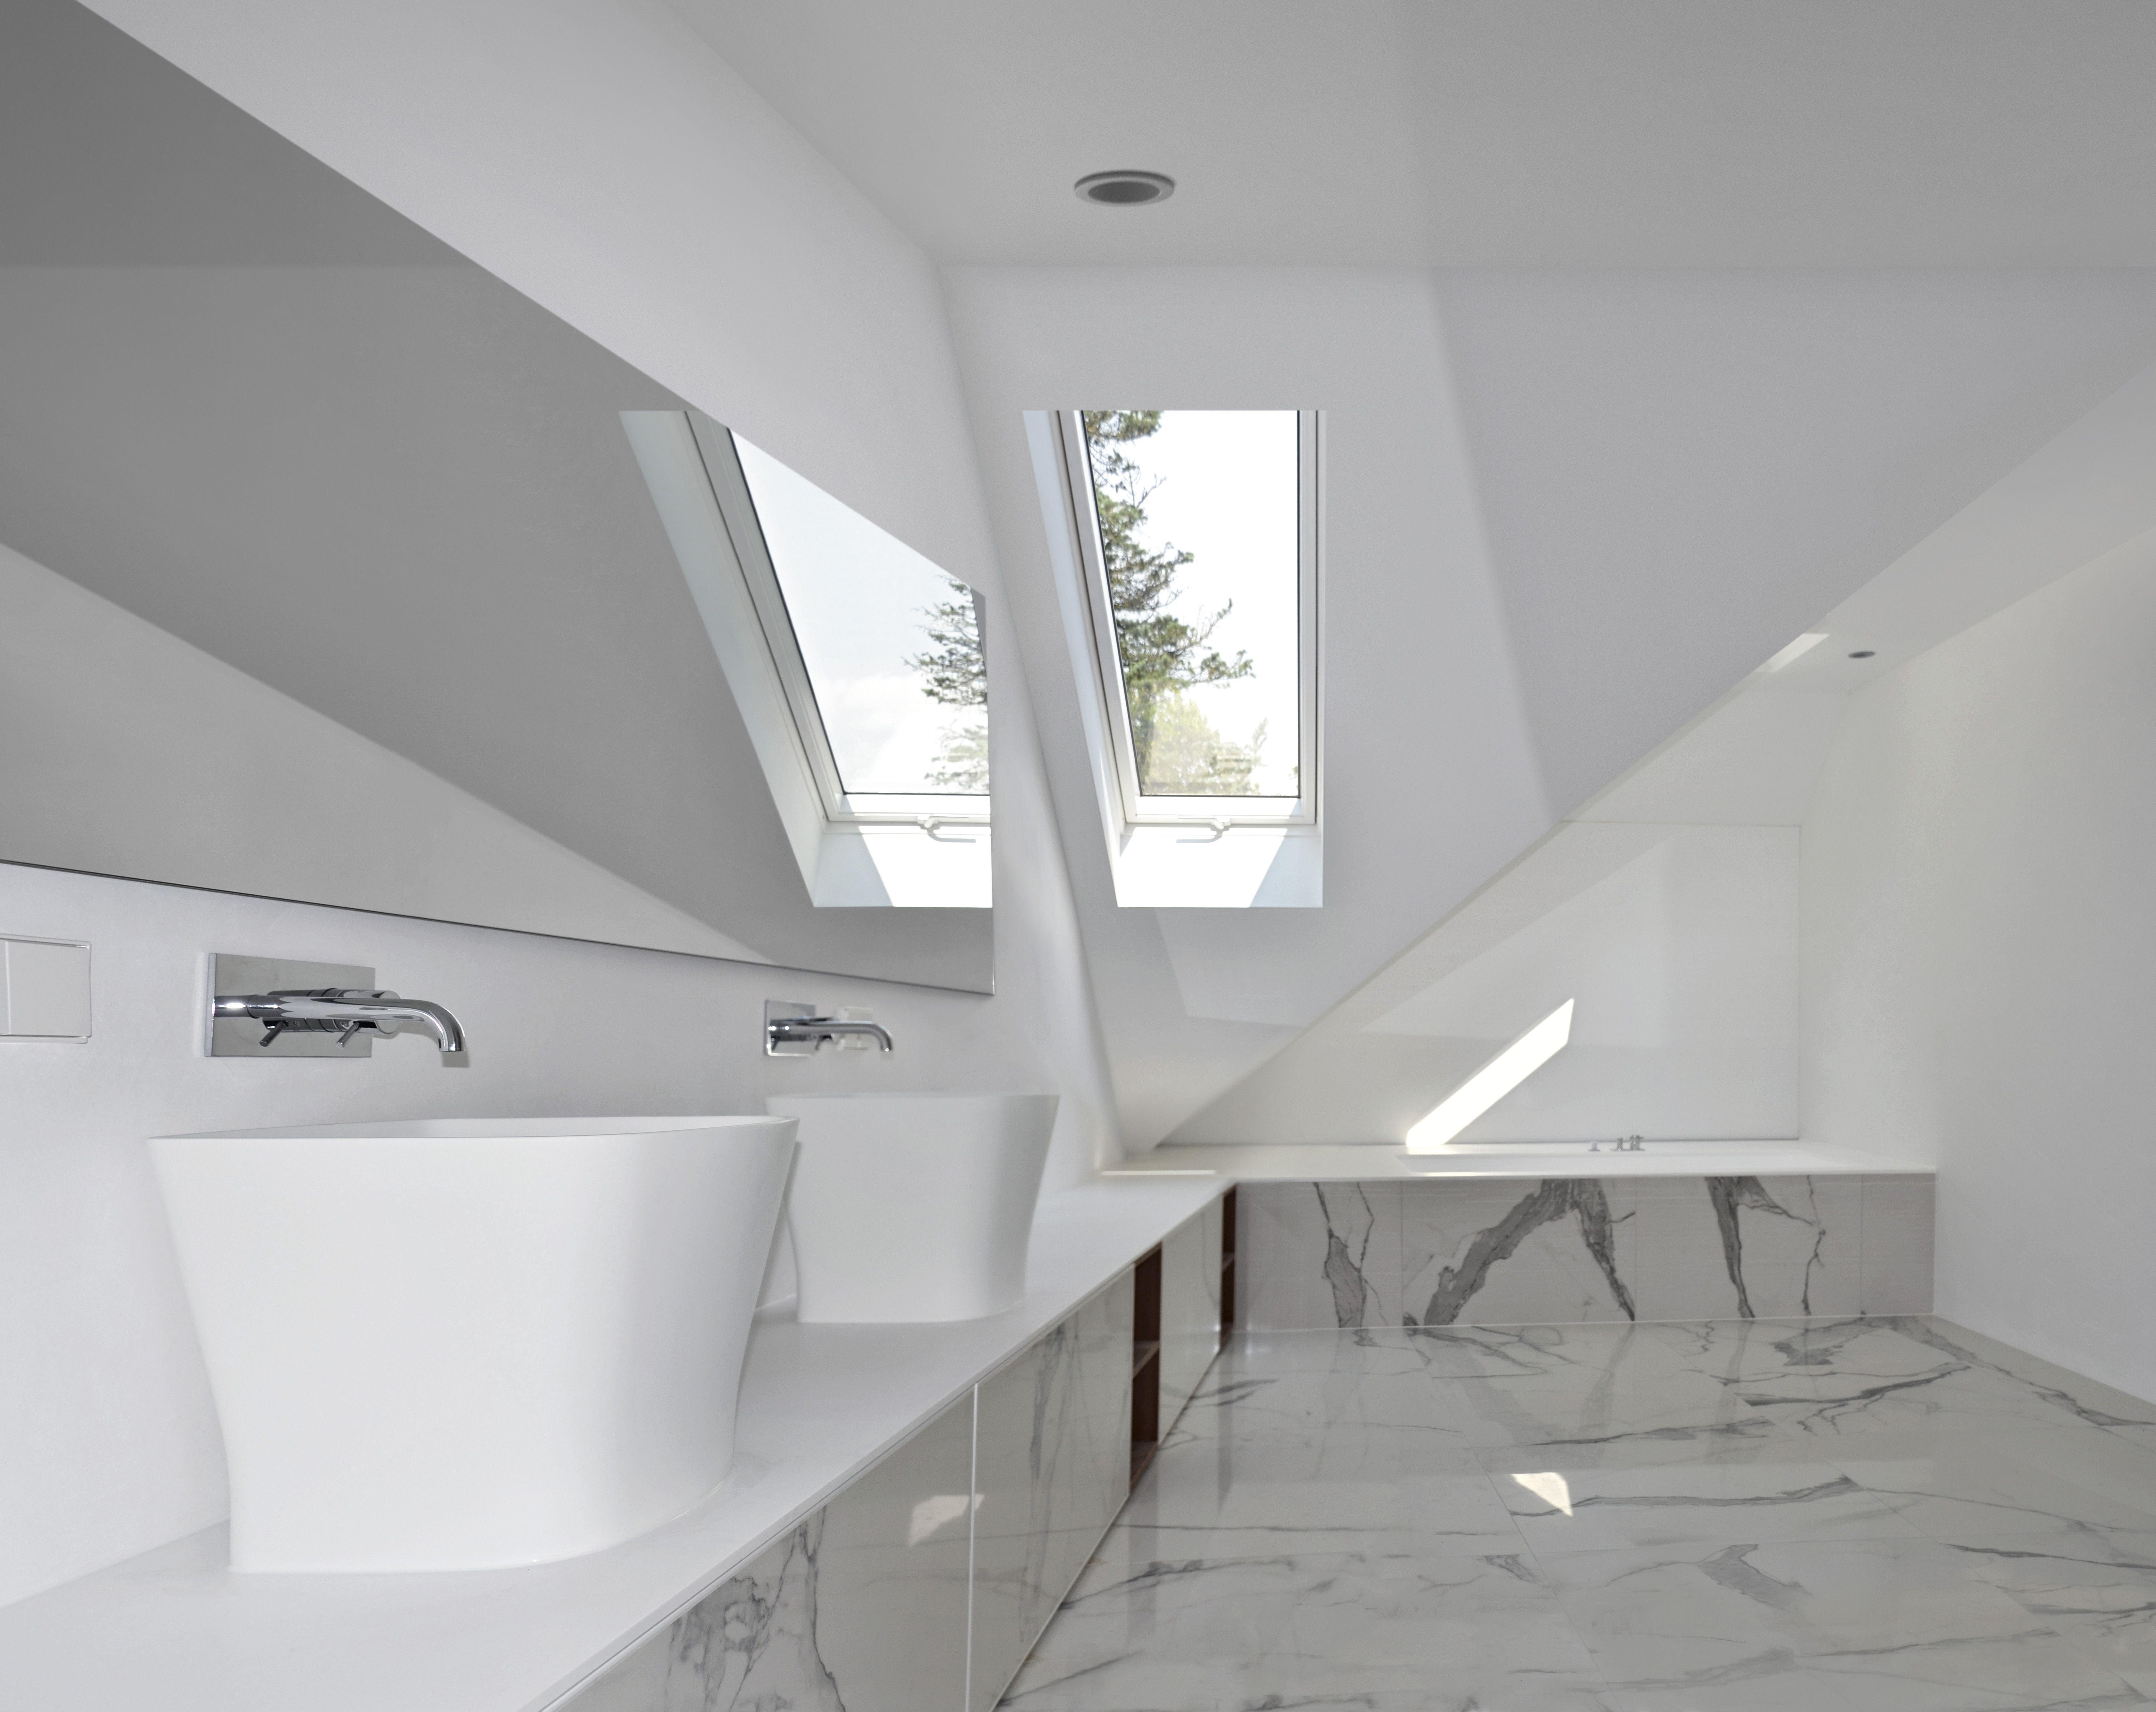 peel product bathtubs undermount believe bathtub search tub tile results freestanding